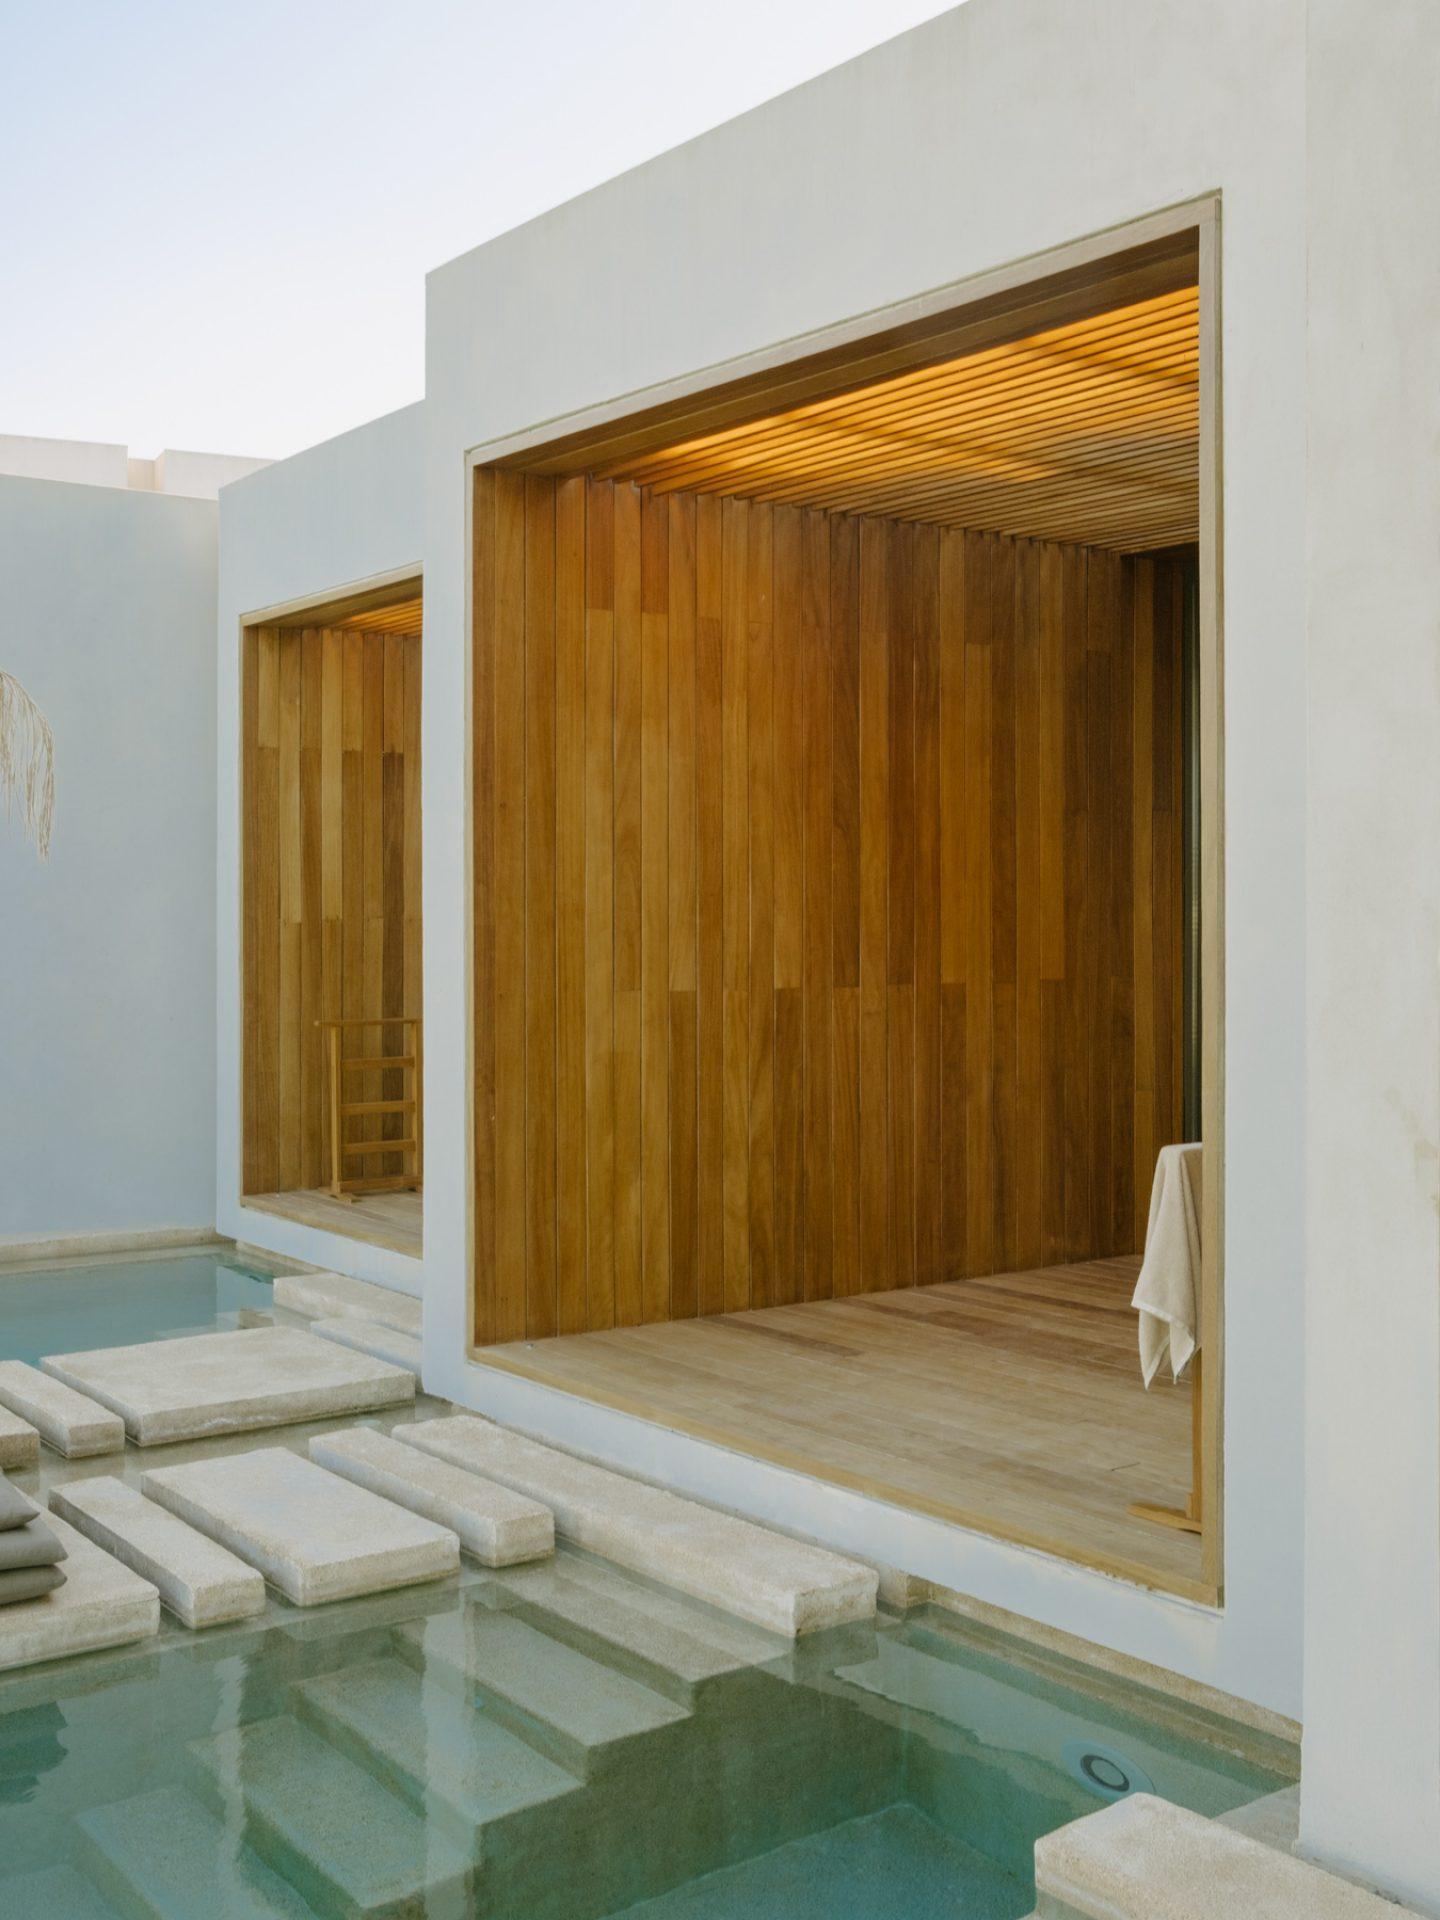 IGNANT-Travel-Olea-All-Suite-hotel-Greece-01